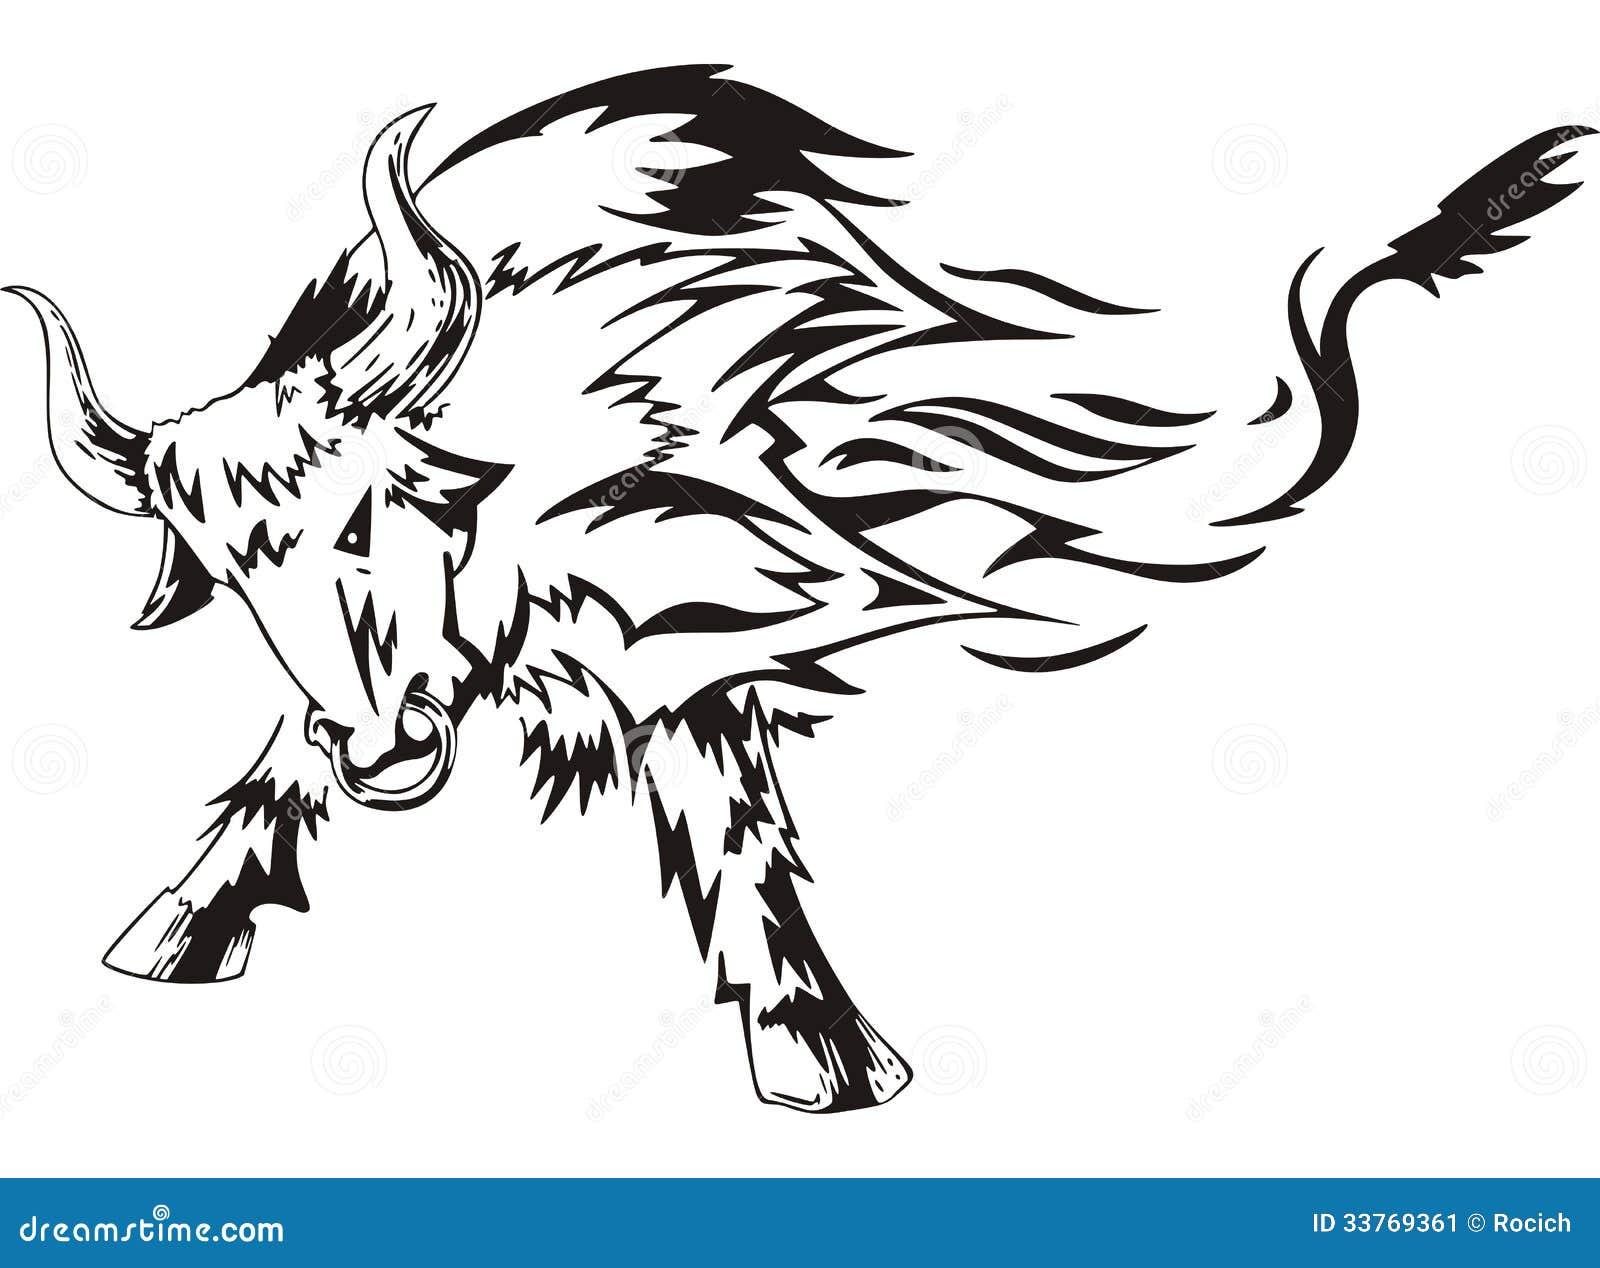 Bull Tattoo Stock Vector Illustration Of Black Decorative 33769361